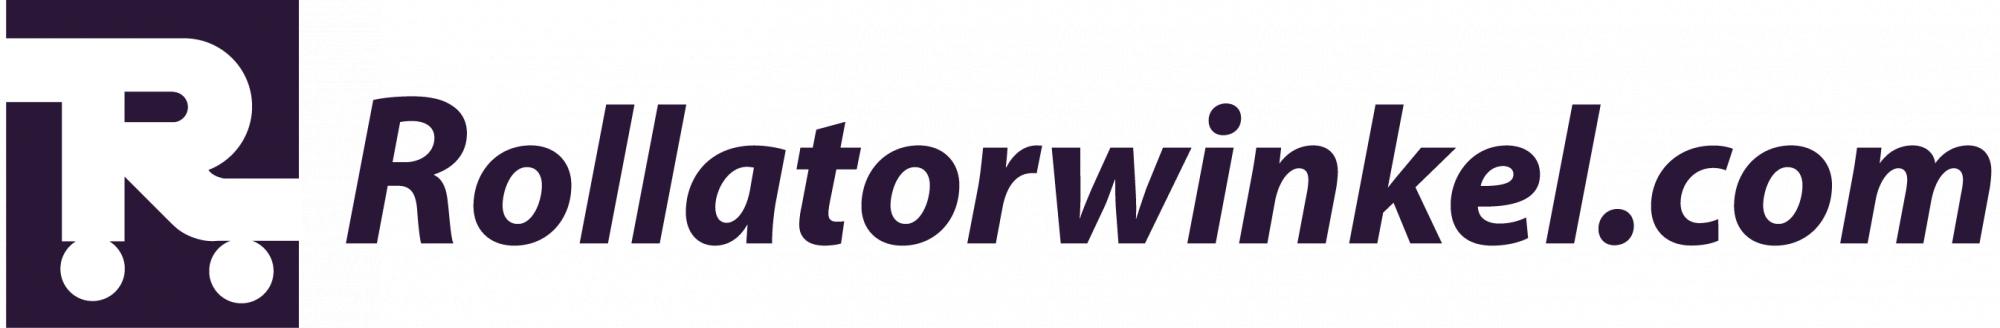 Rollatorwinkel.com logo